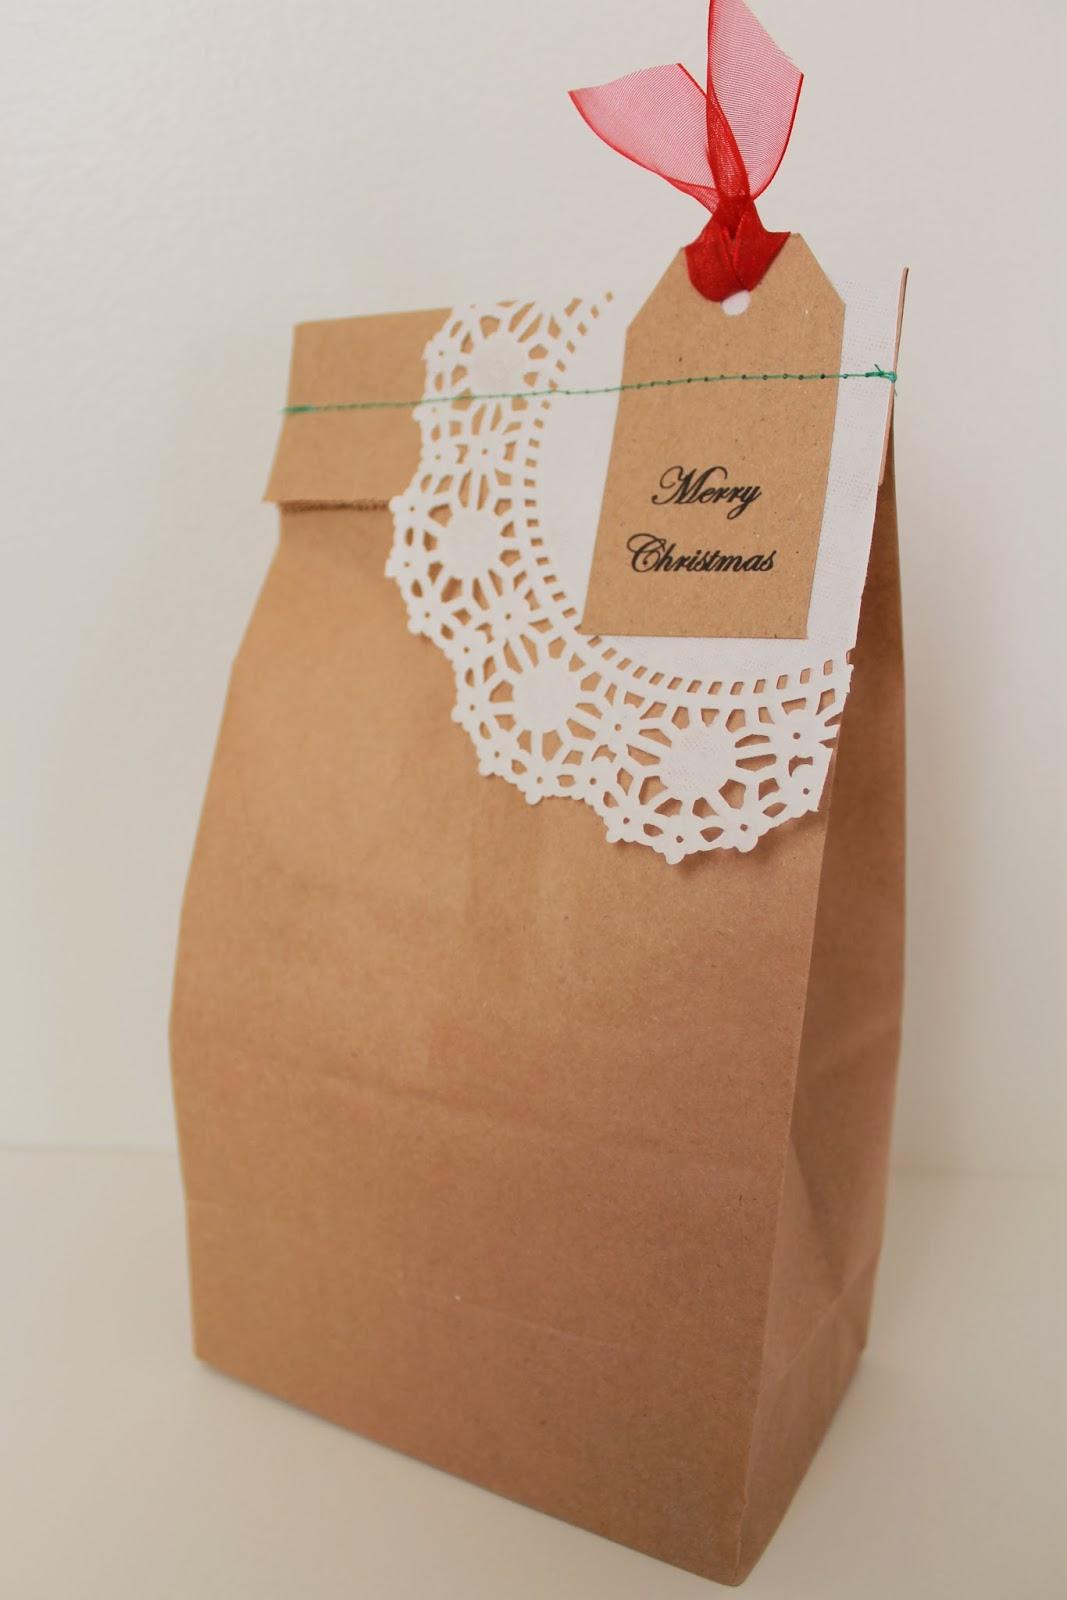 Serving Pink Lemonade Dressing Up Papers Bag For Holiday Gift Giving